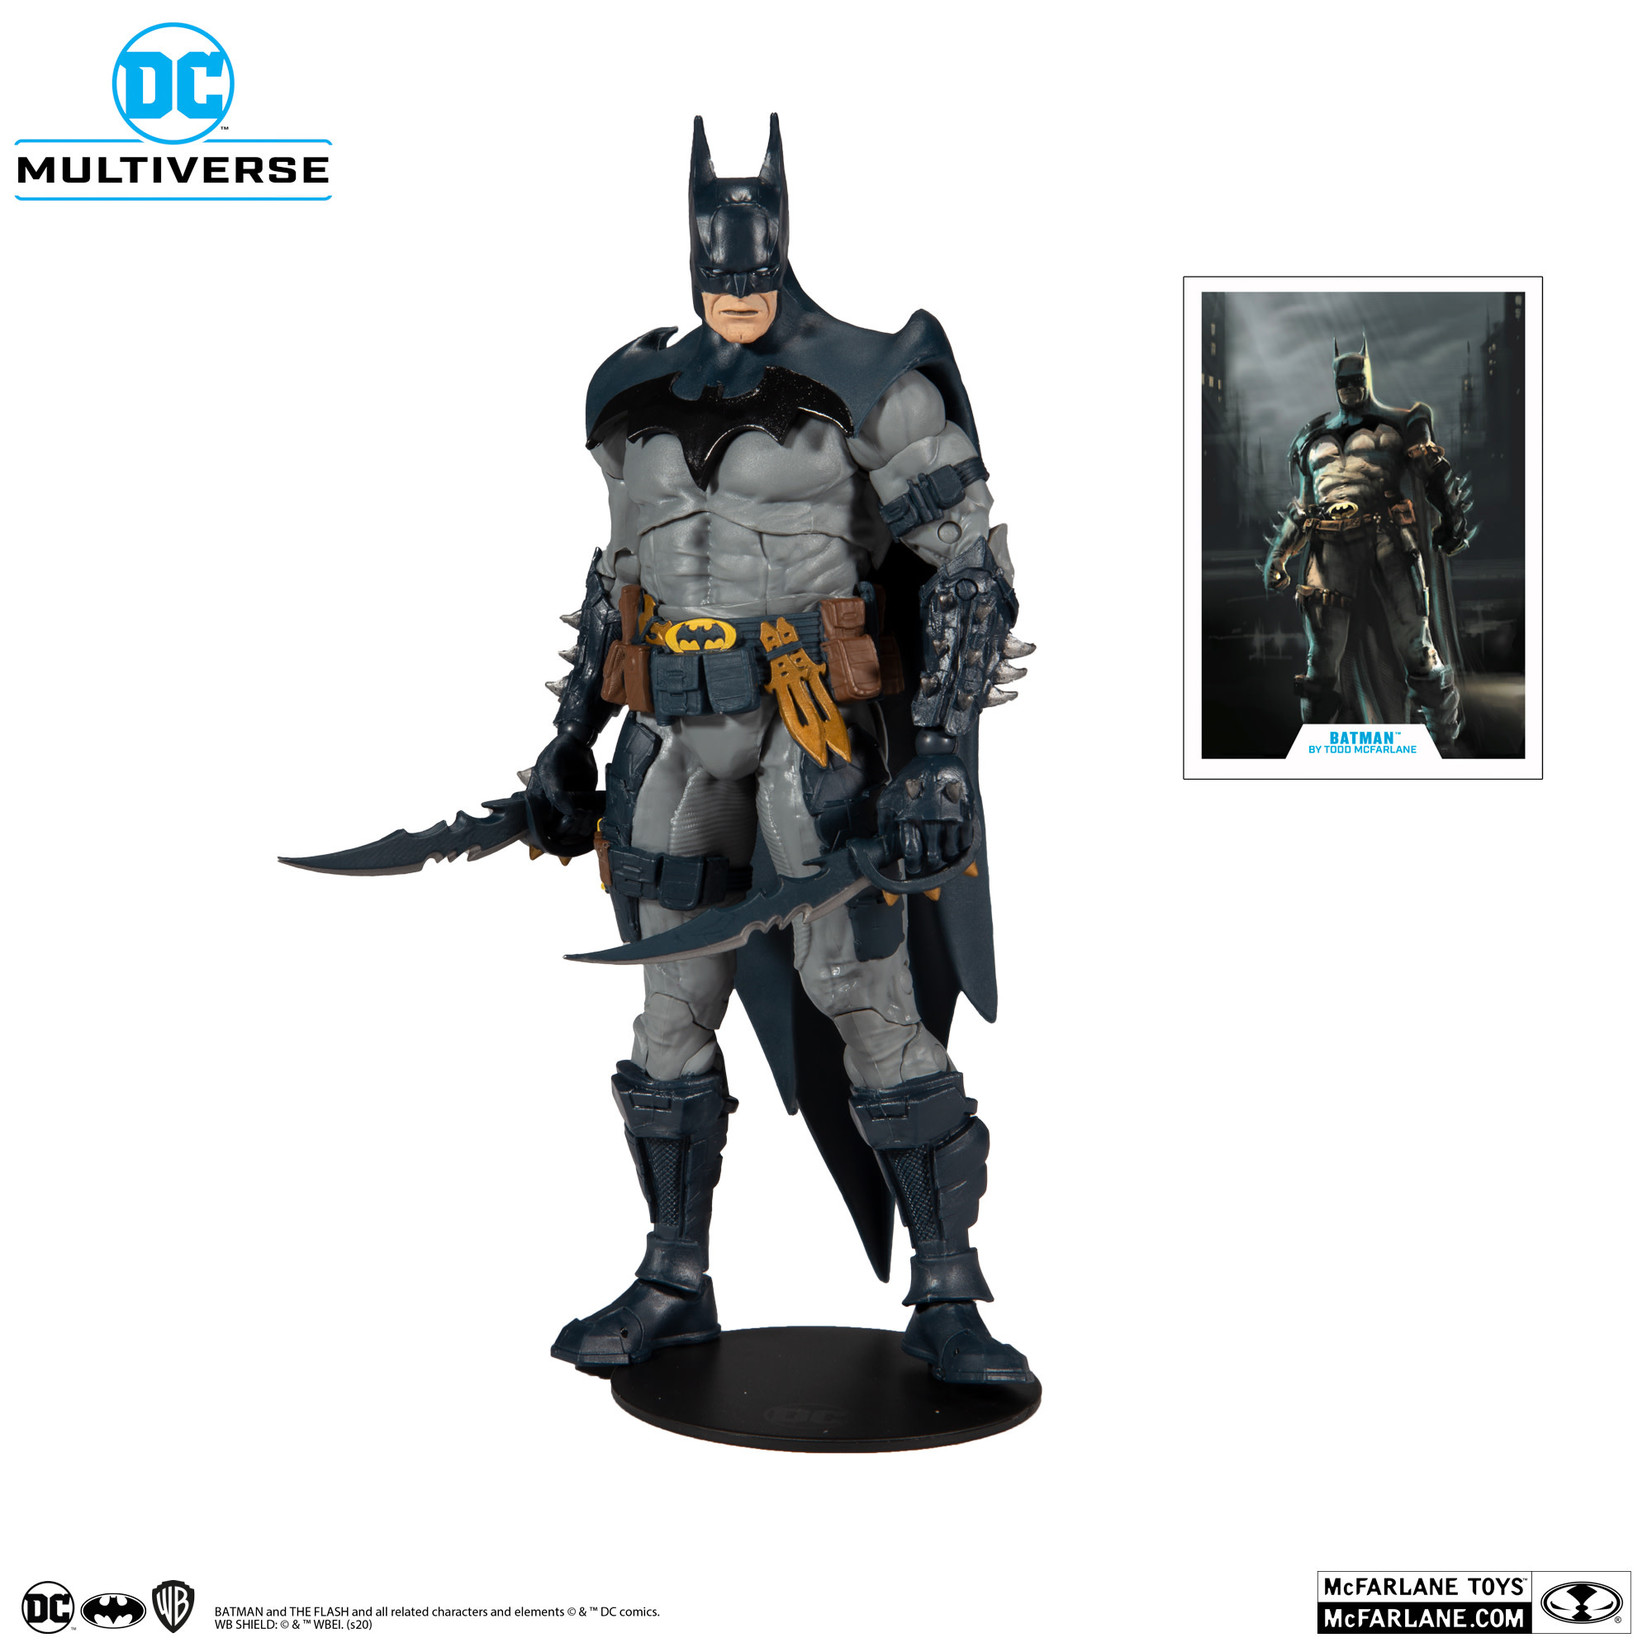 McFarlane Toys DC MULTIVERSE BATMAN DESIGNED BY TODD MCFARLANE